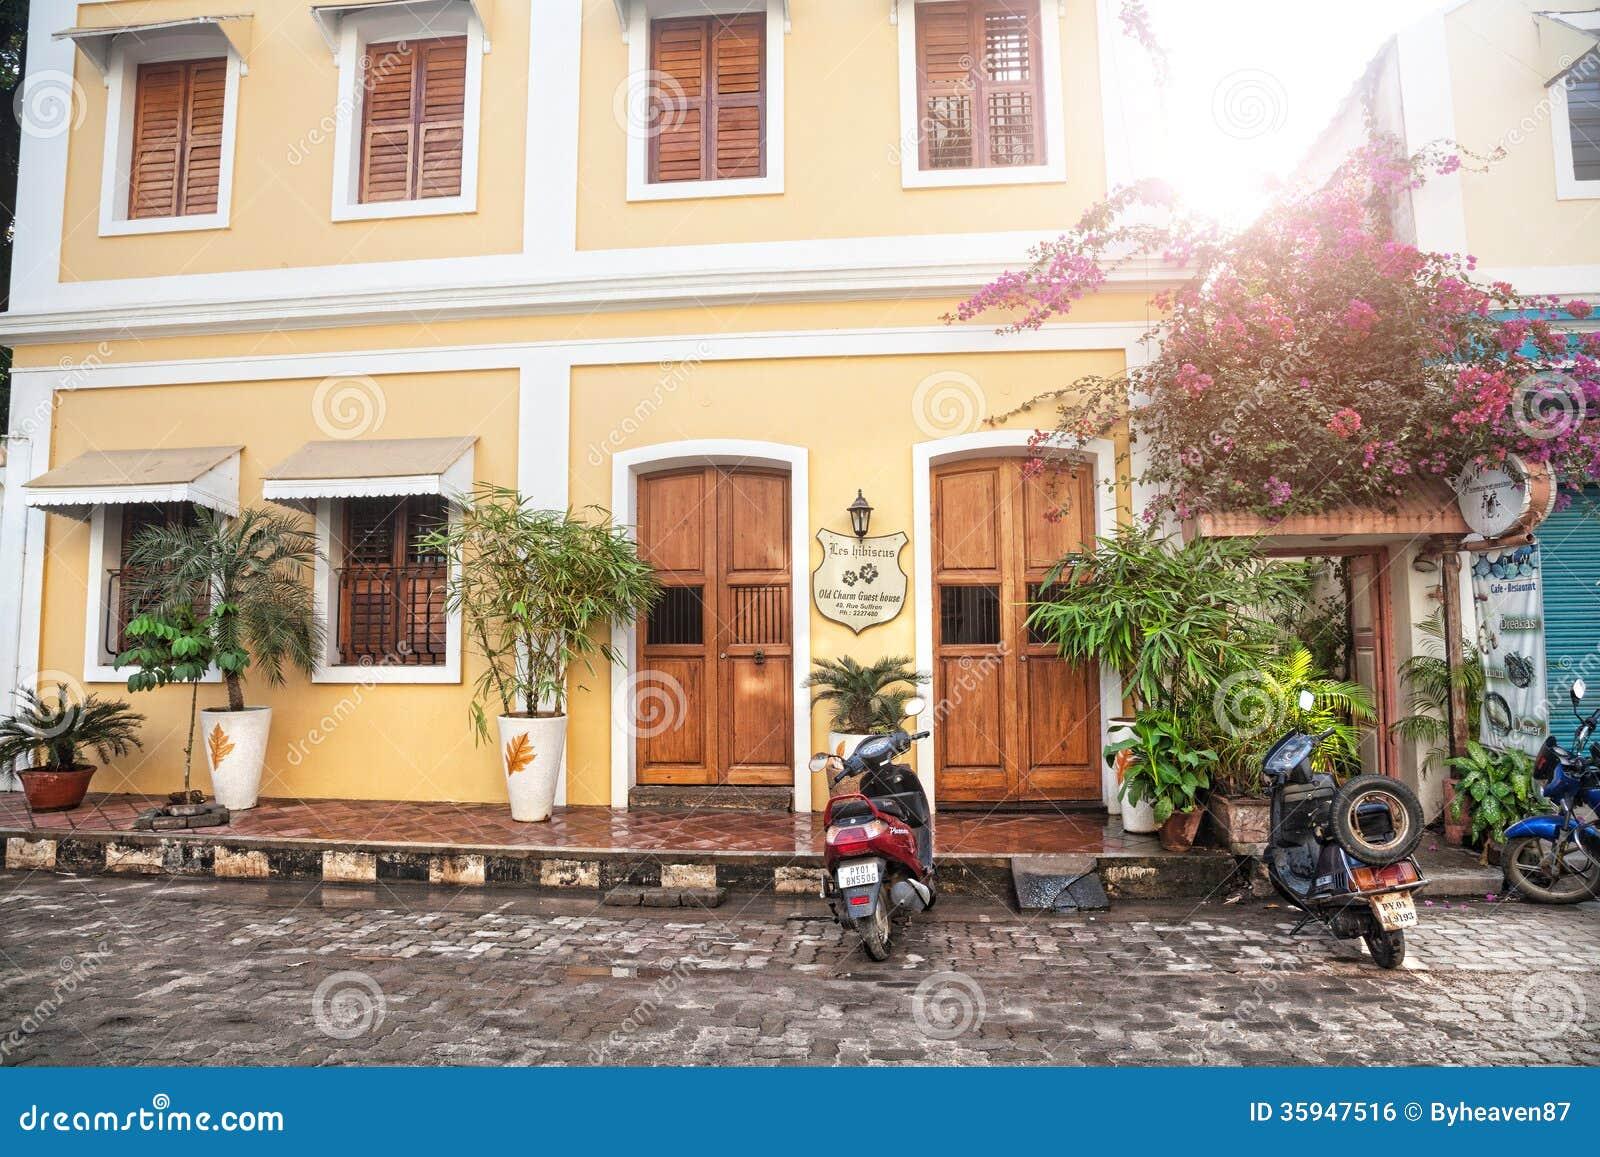 French Architecture Pondicherry India Stock Photos Images